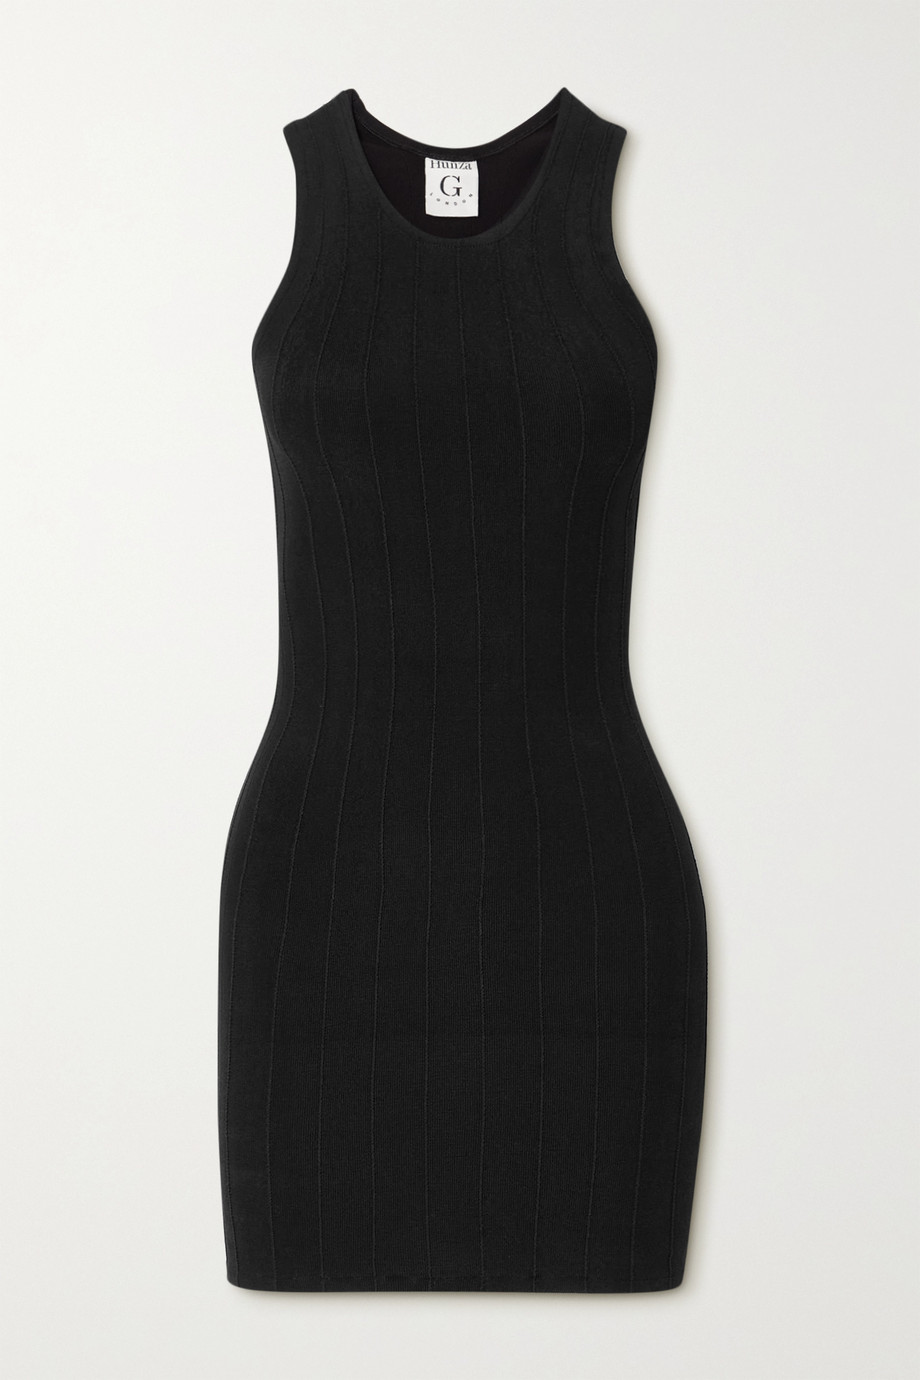 Hunza G + NET SUSTAIN Iris Nile ribbed-knit mini dress